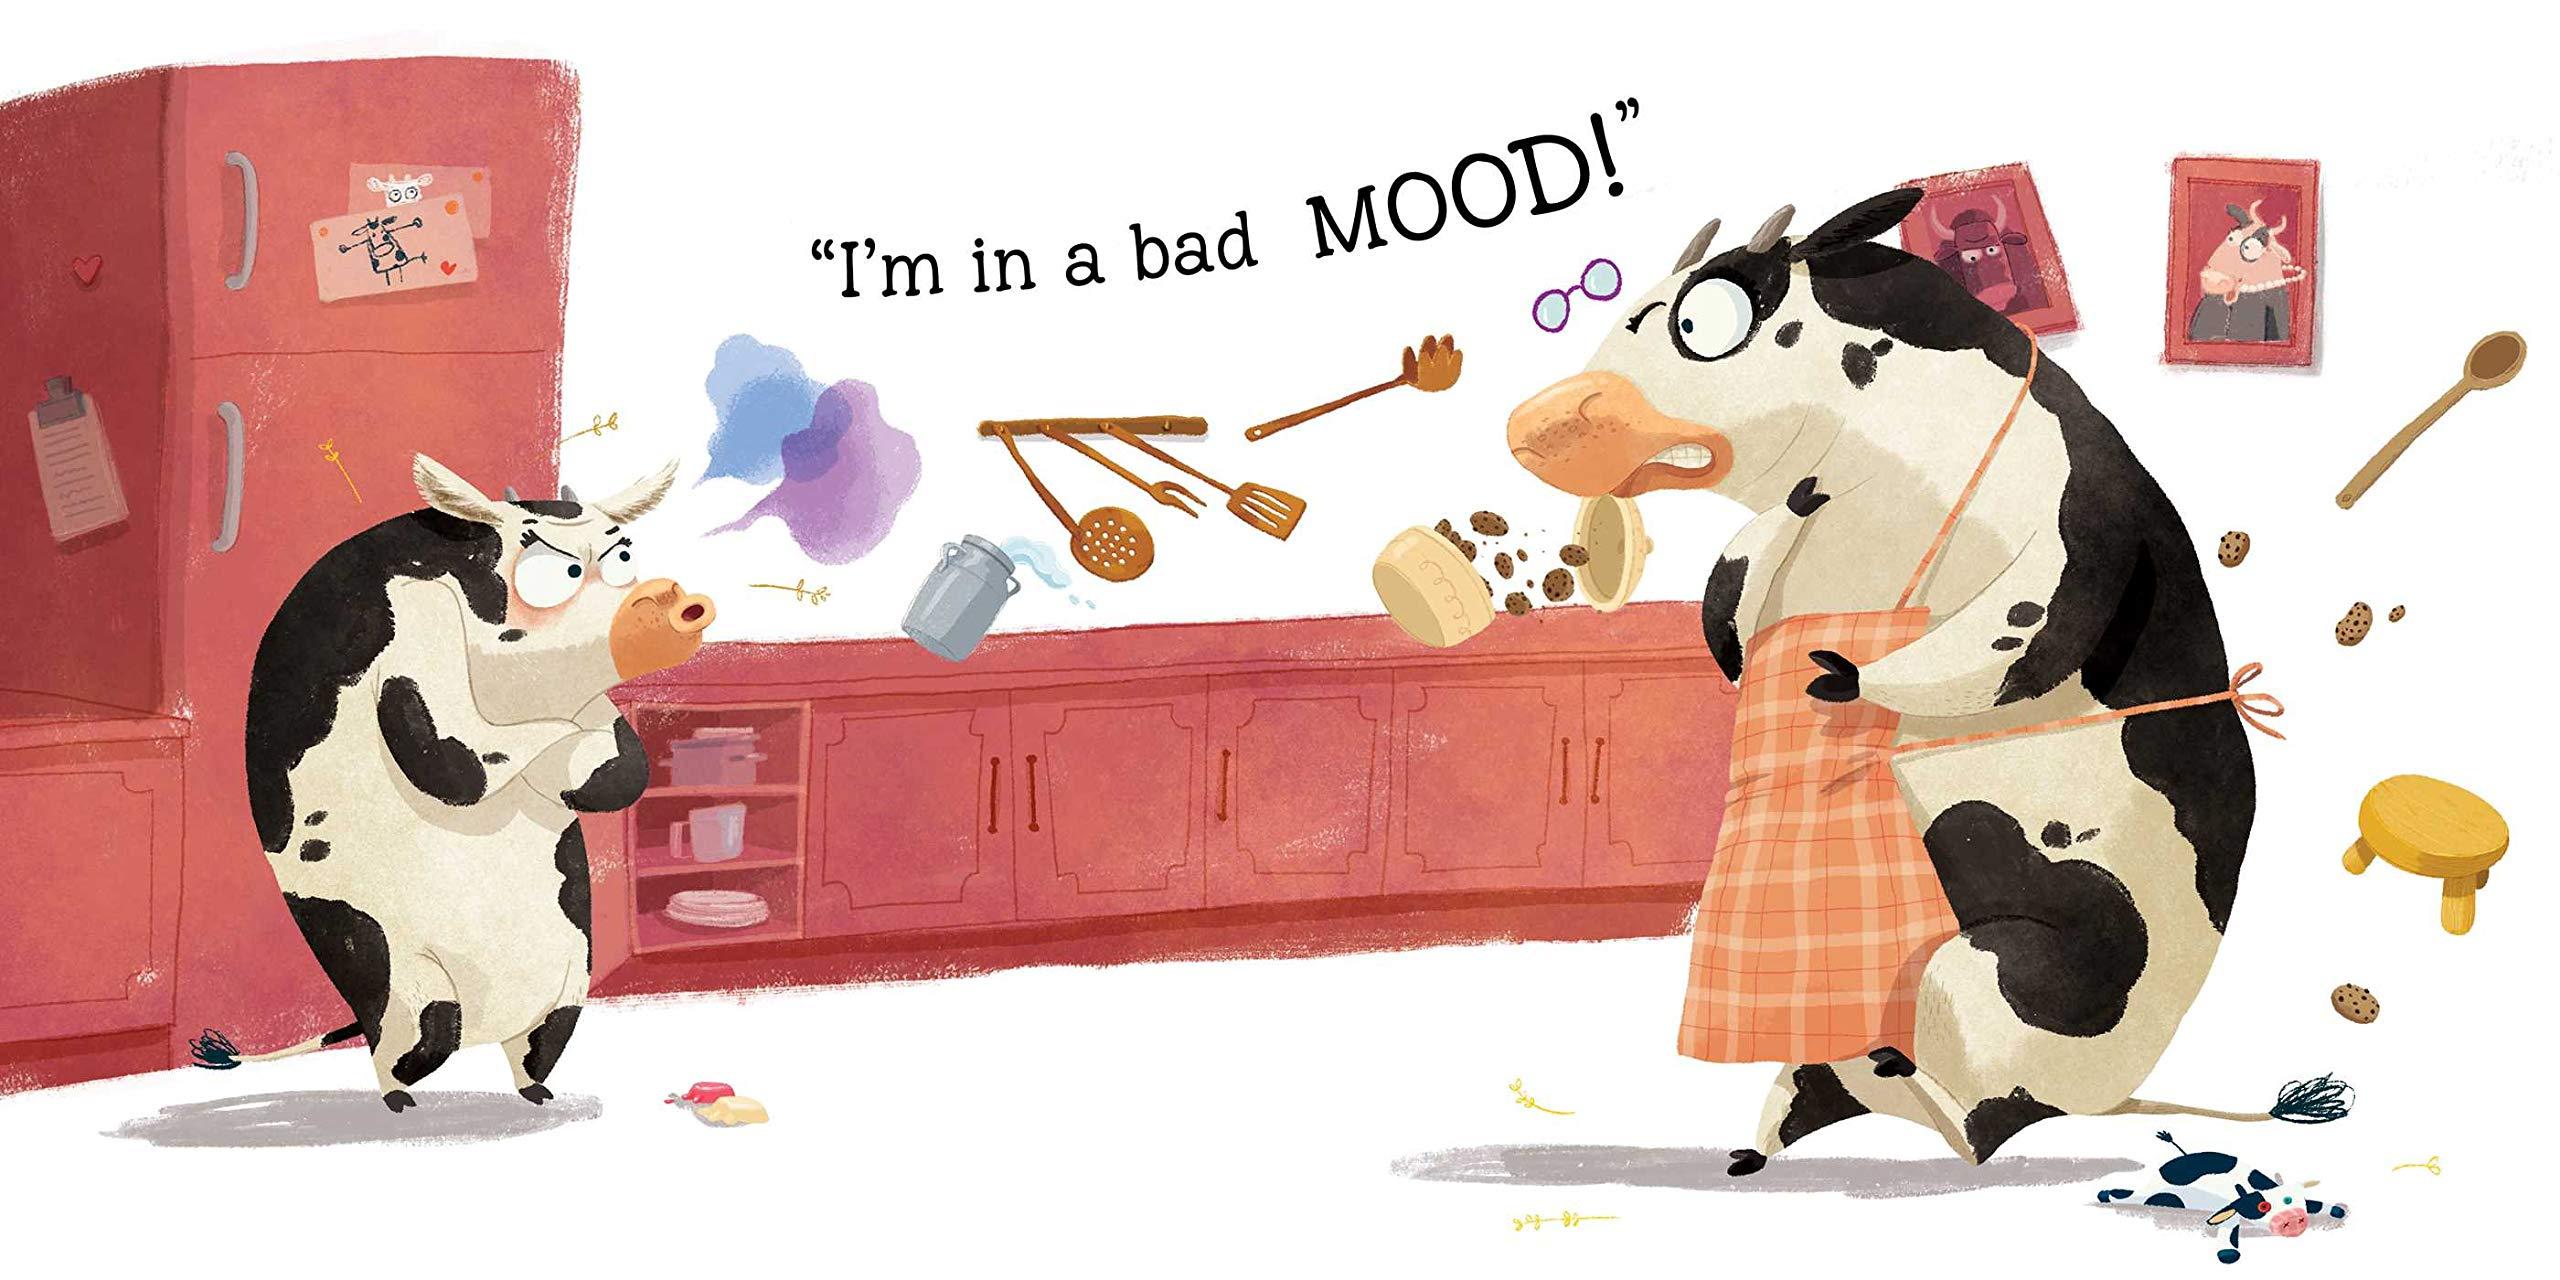 celebrate-picture-books-picture-book-review-mootilda's-bad-mood-kitchen